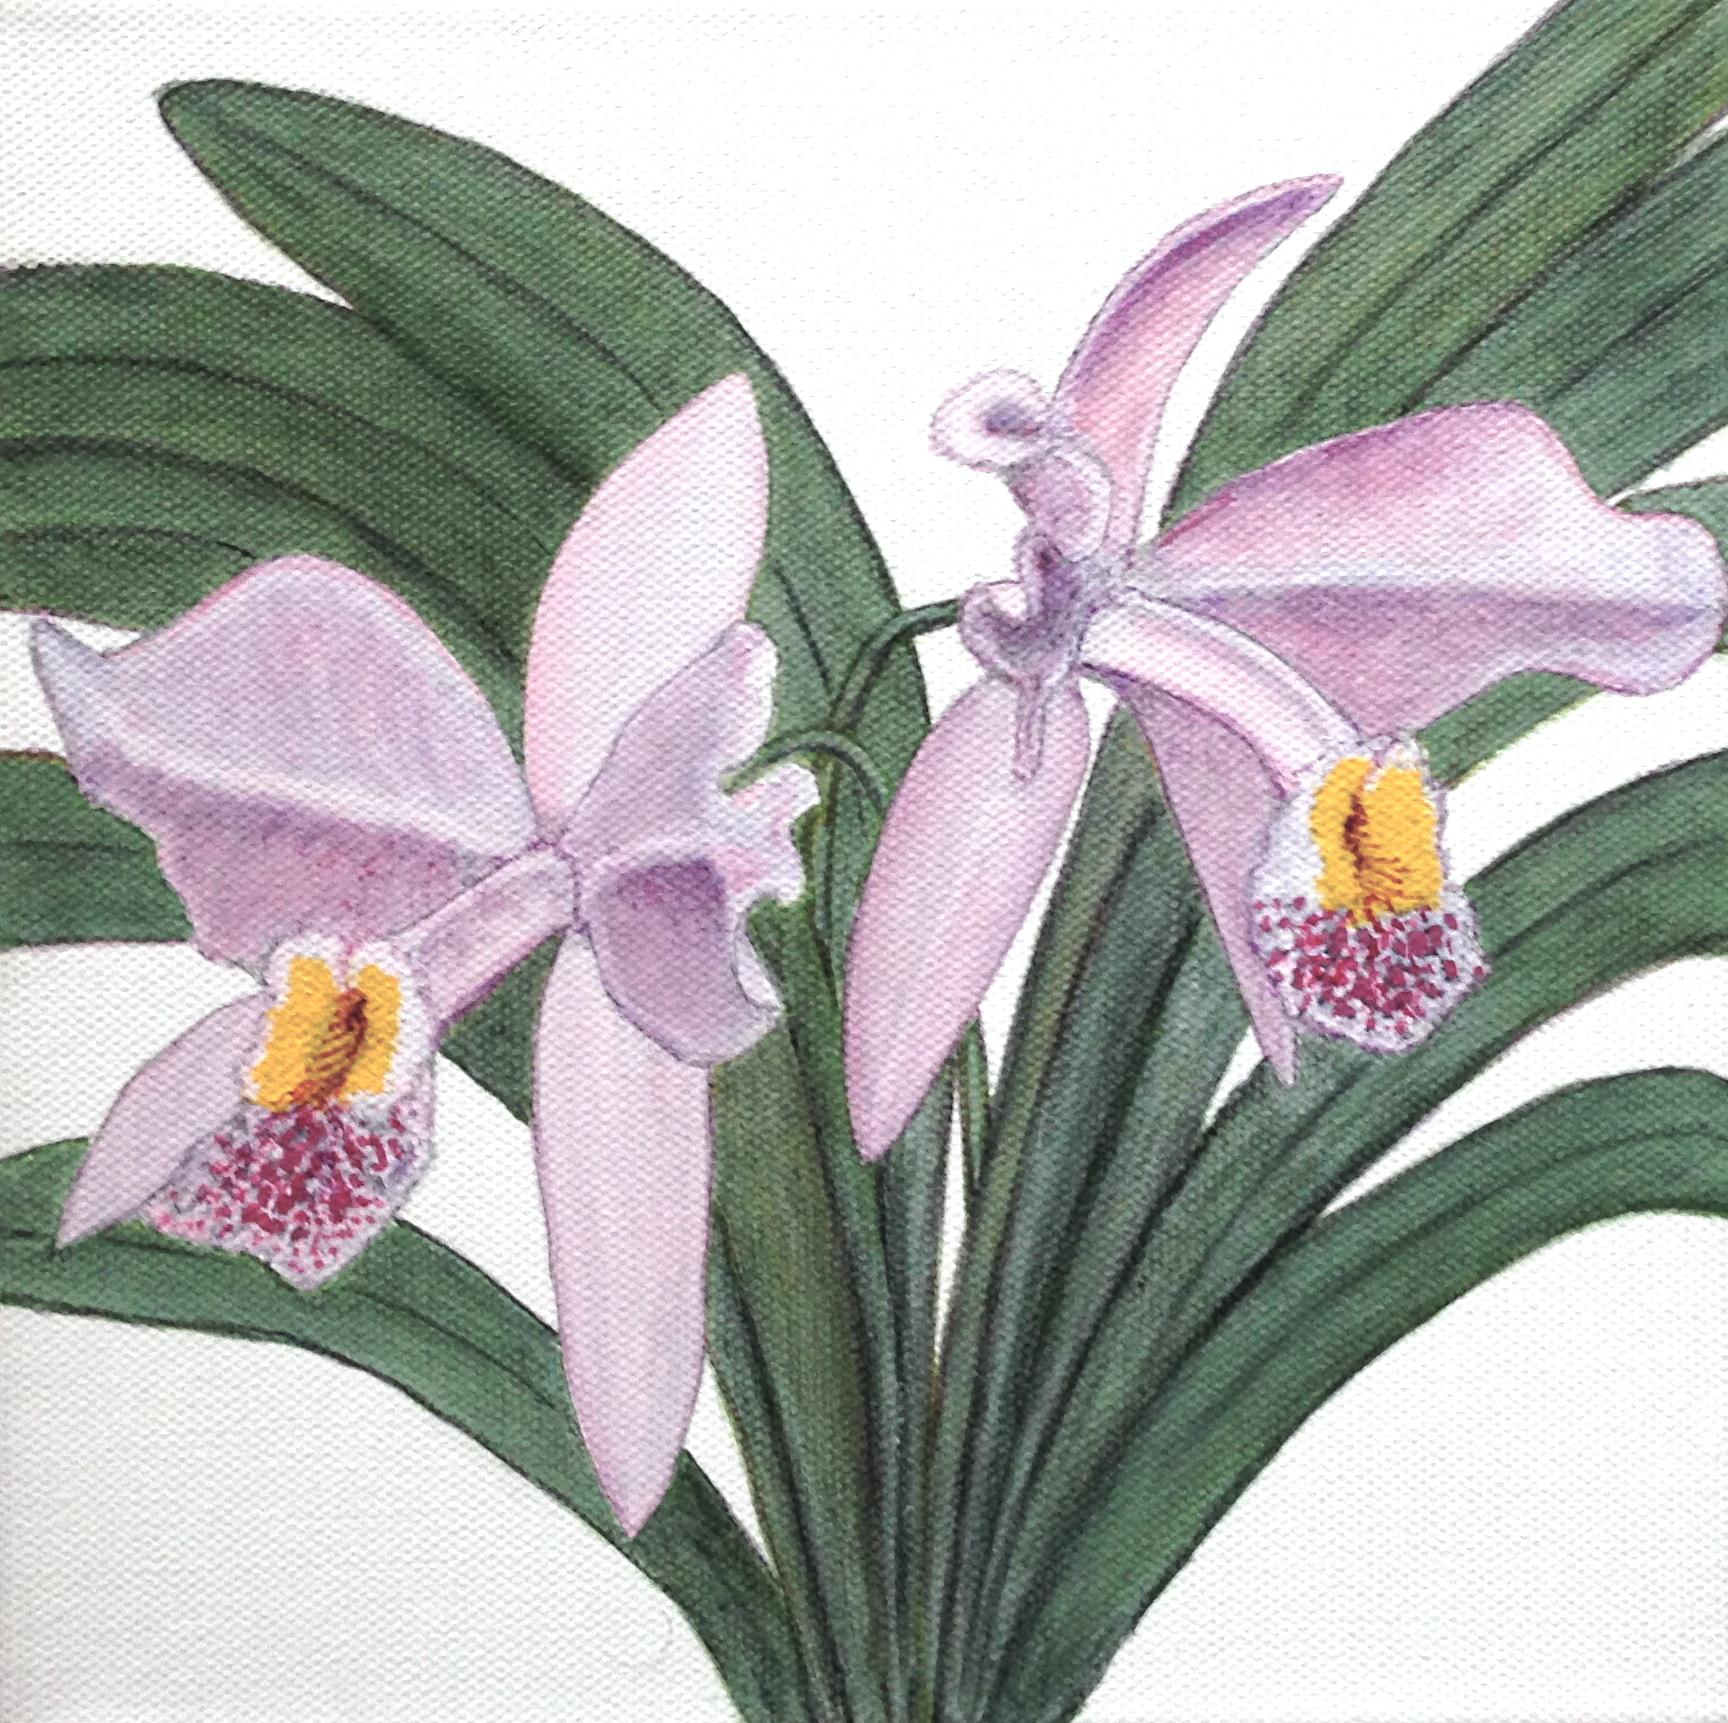 Orchids by David DeWitt